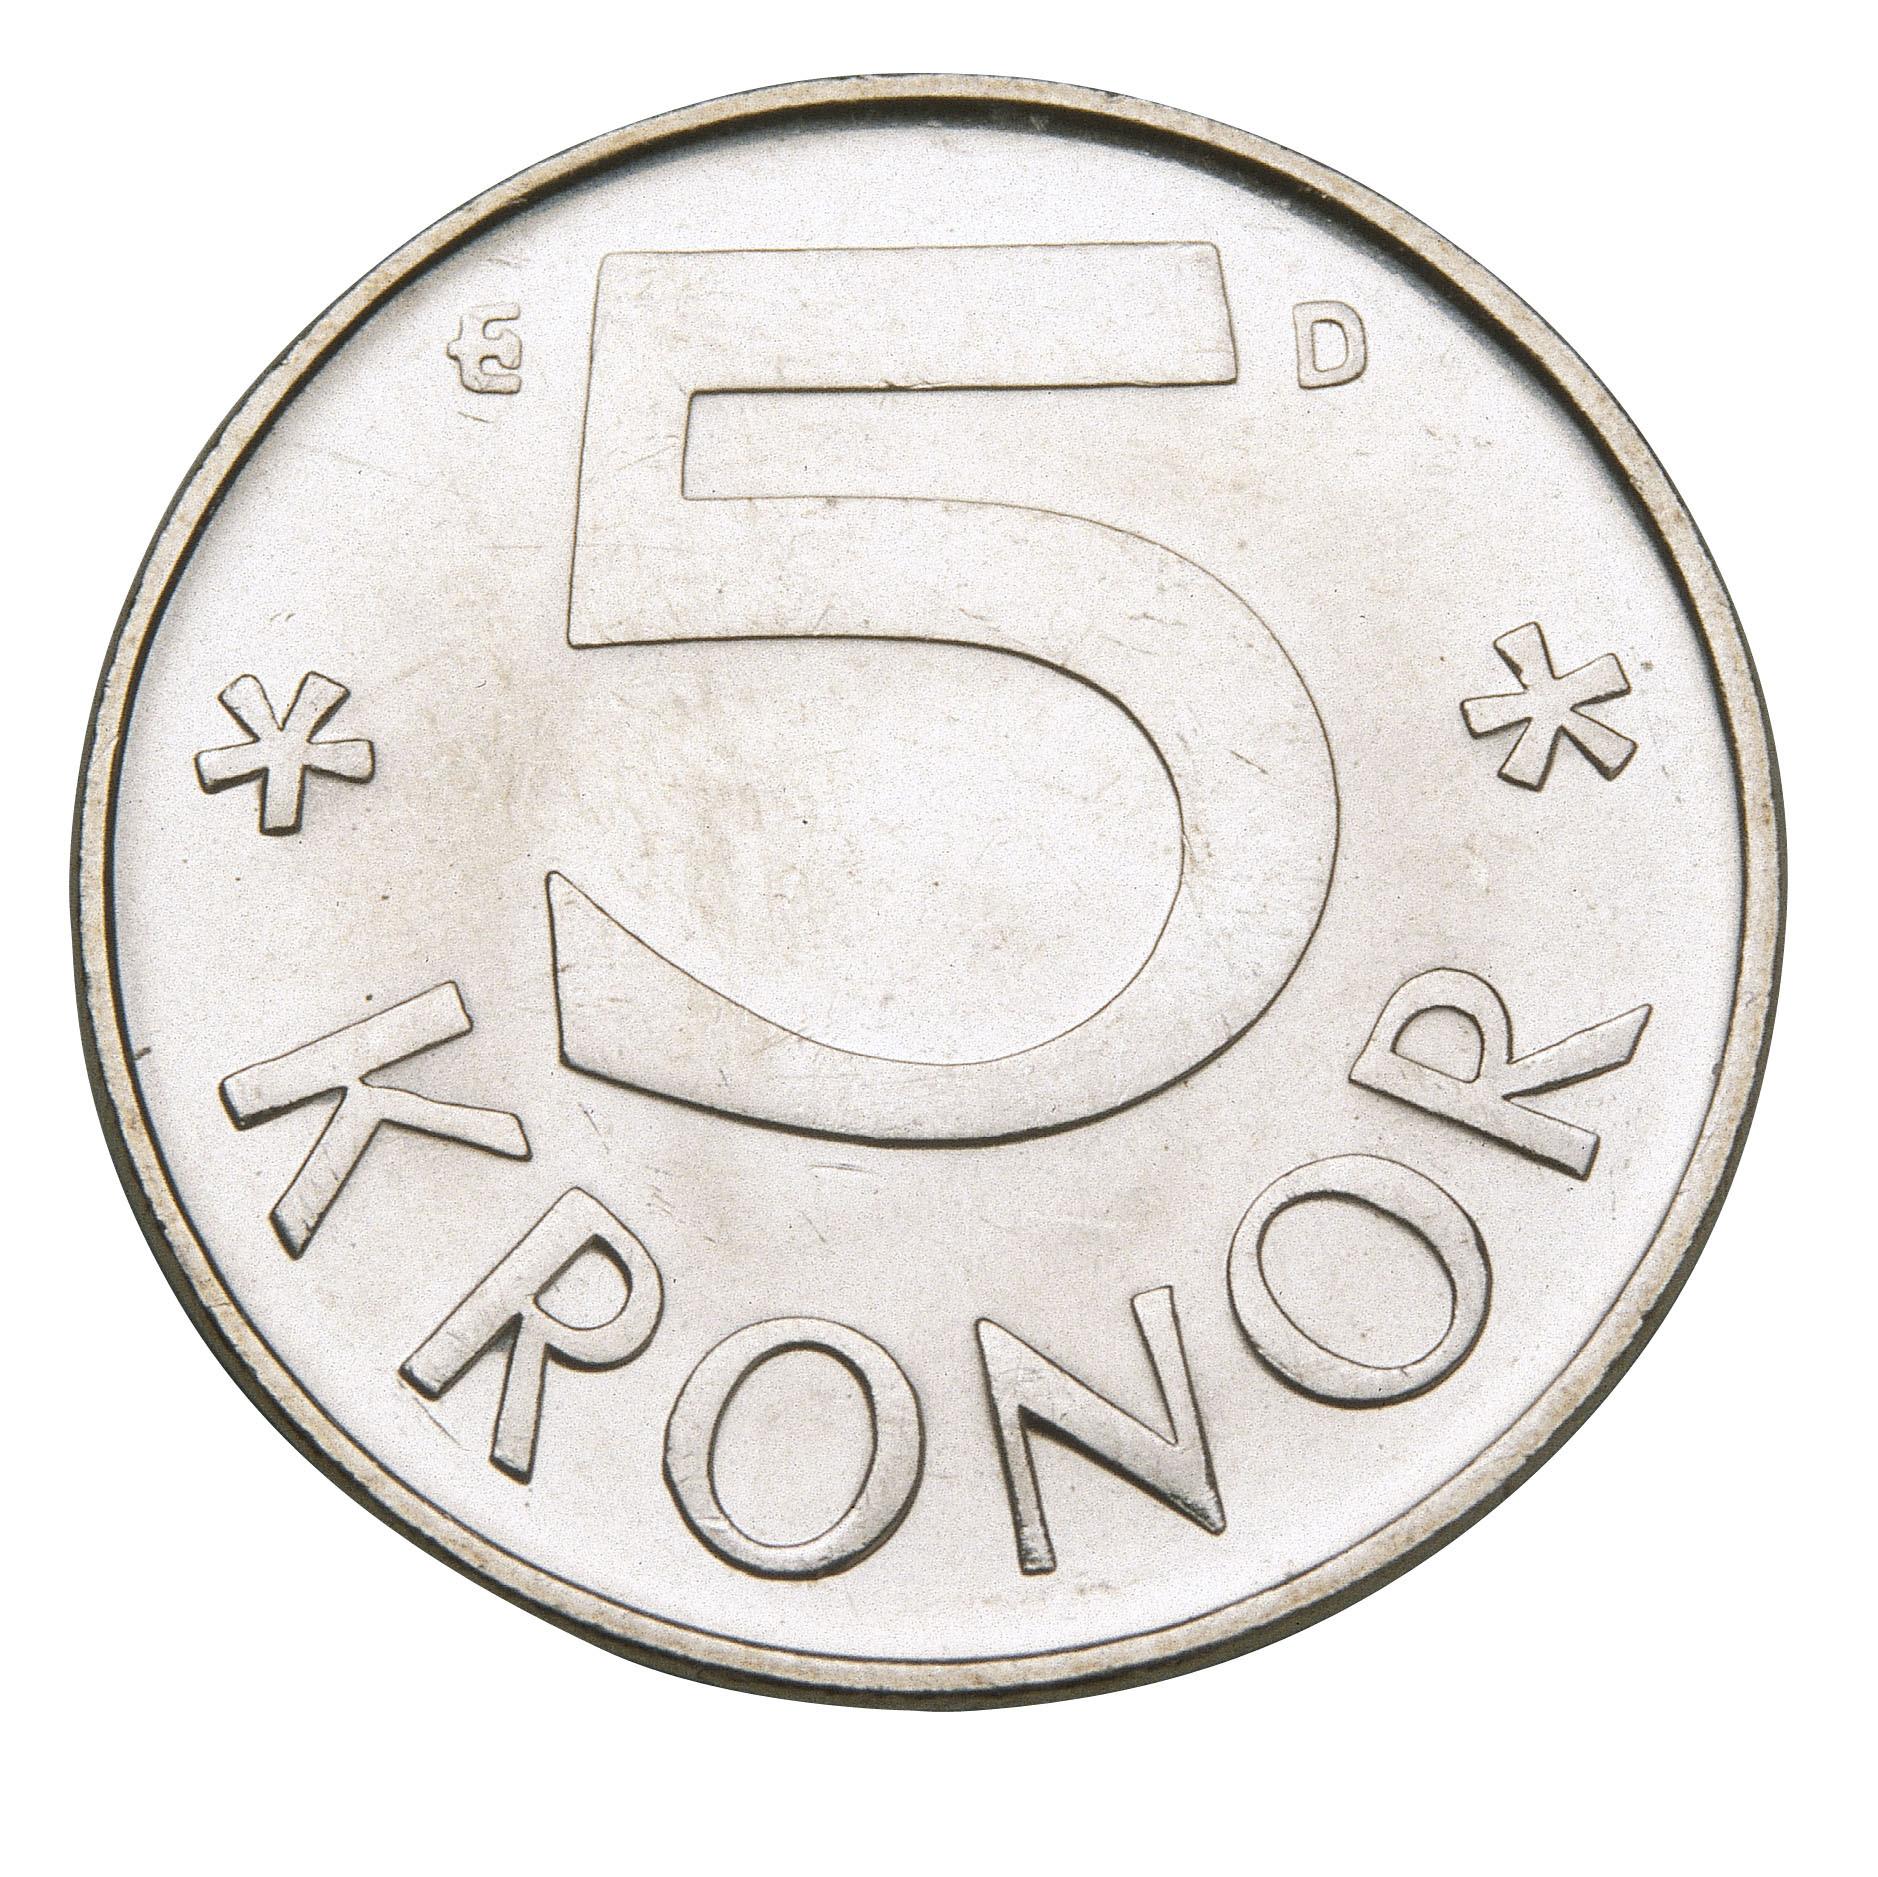 Swedish five crown coin